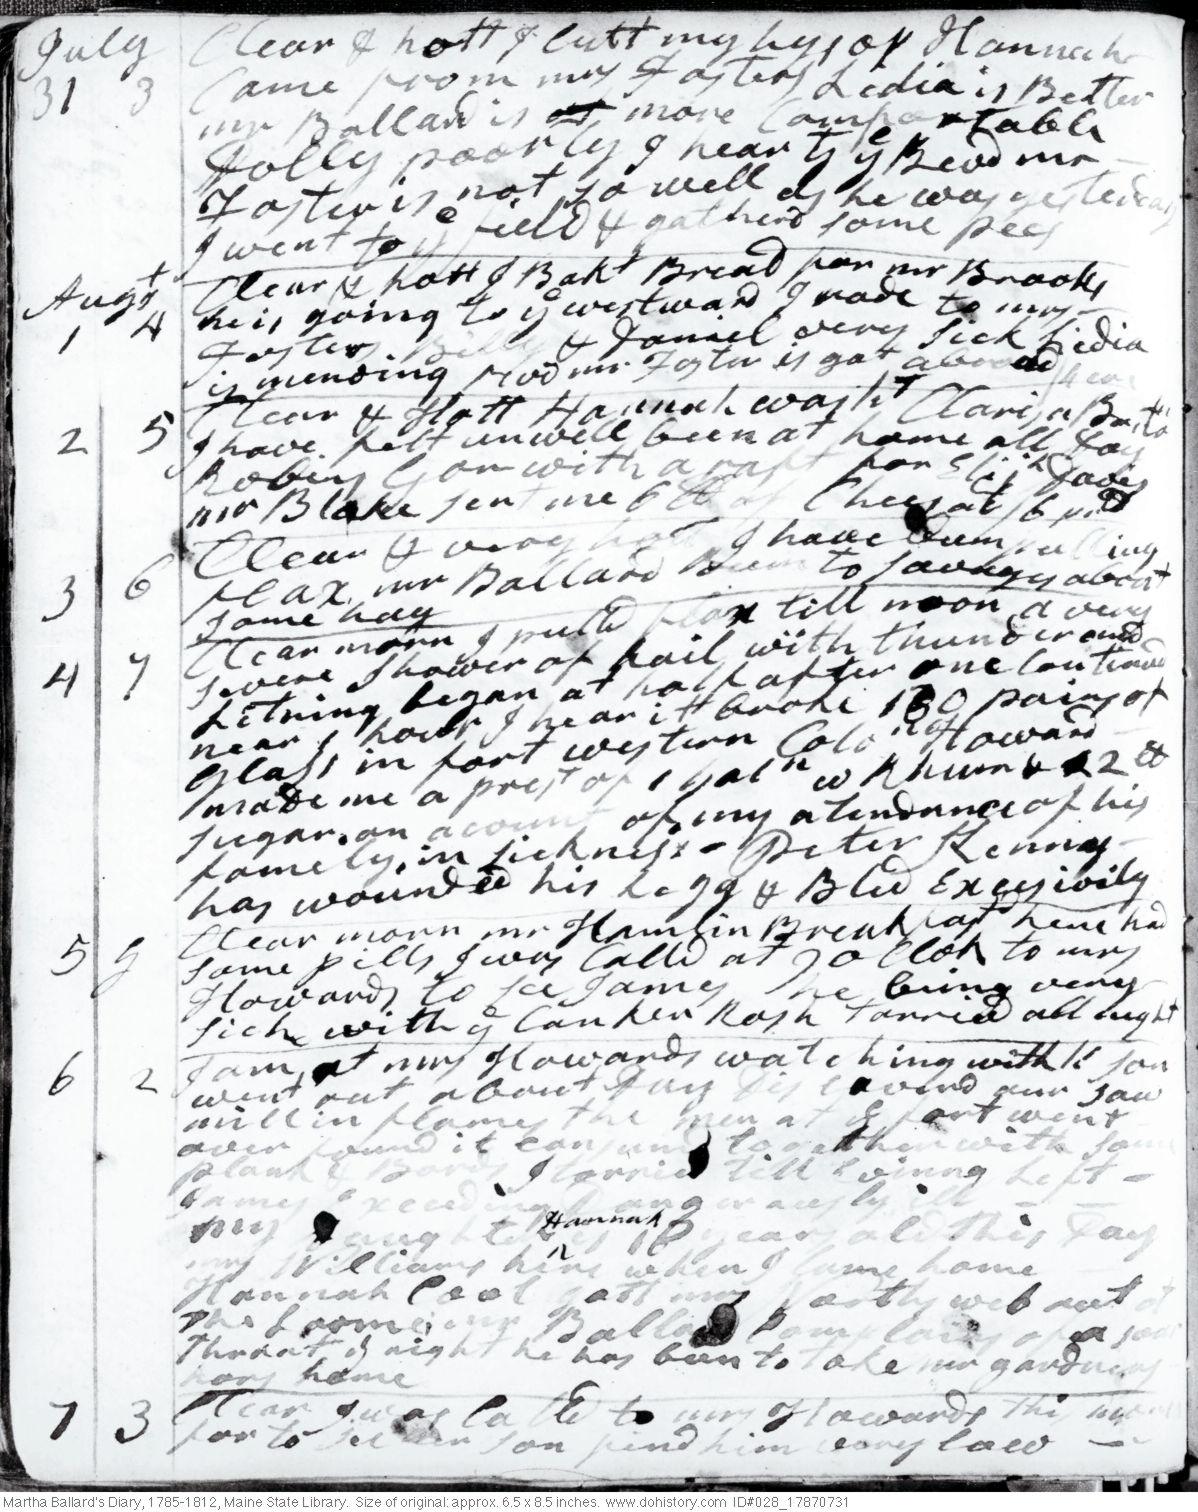 Martha Ballard's Diary, Jul. 31-Aug. 7, 1787 (I)